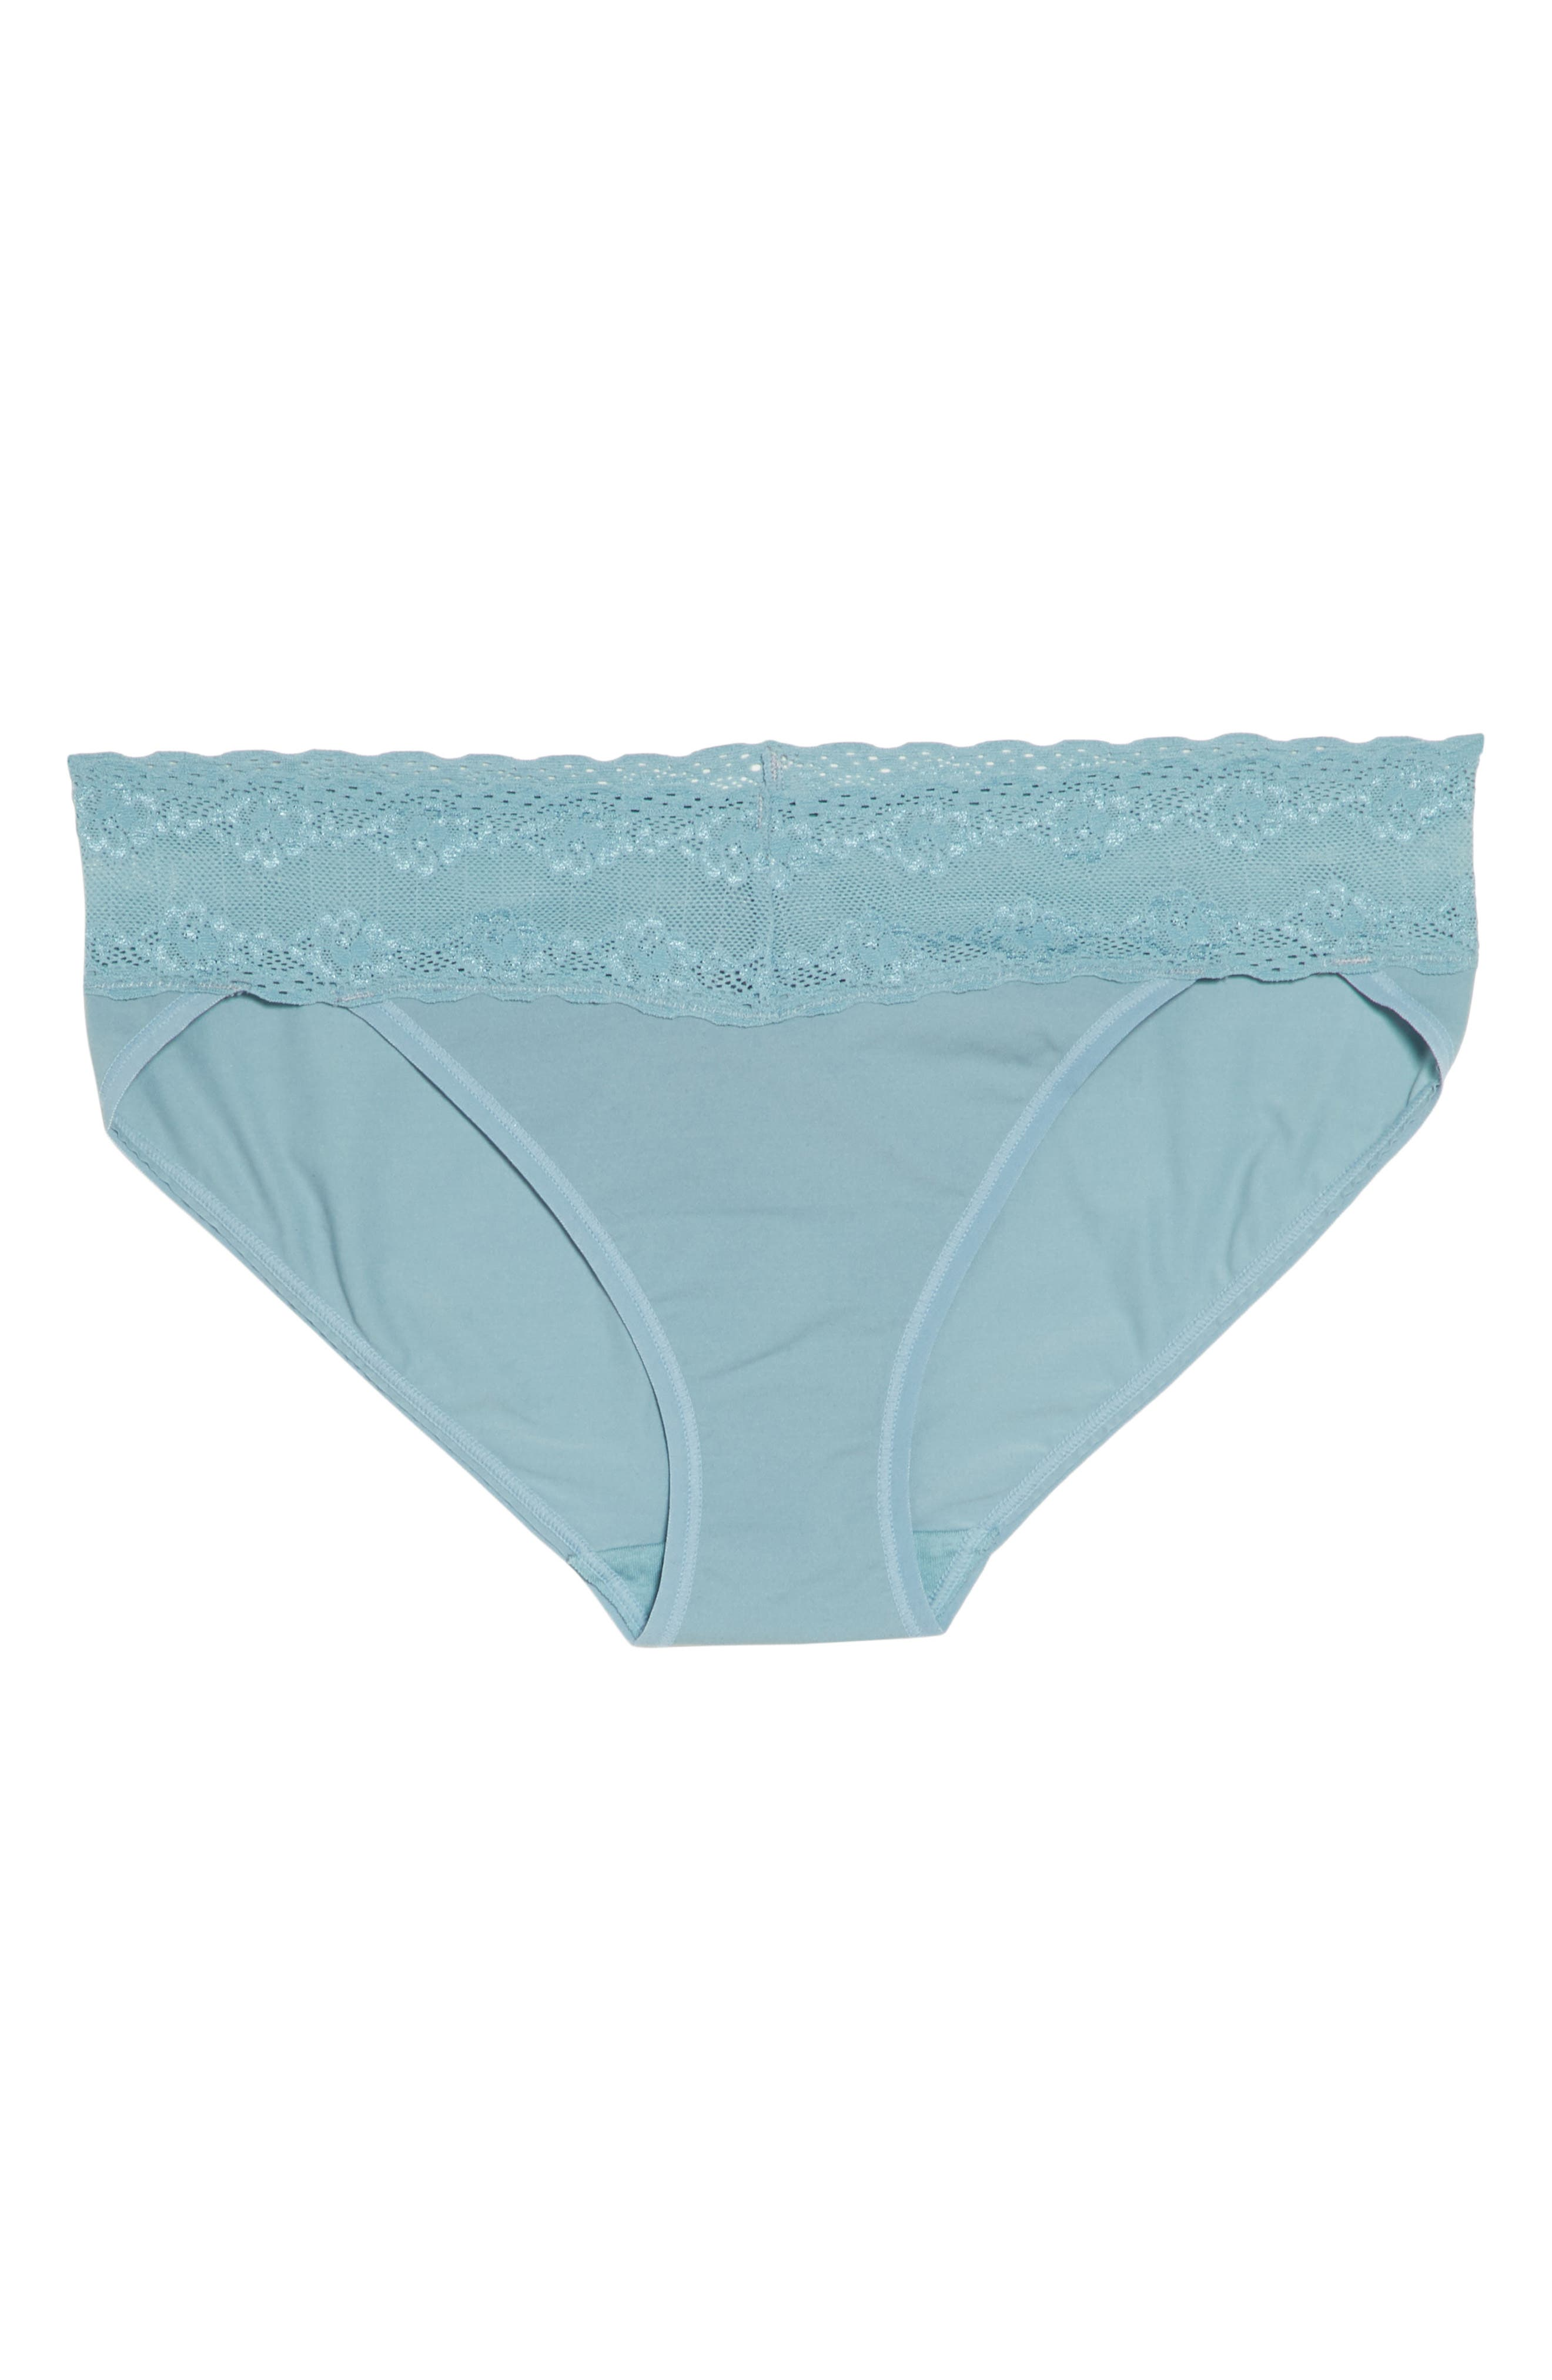 Bliss Perfection Bikini,                             Alternate thumbnail 6, color,                             SMOKE BLUE